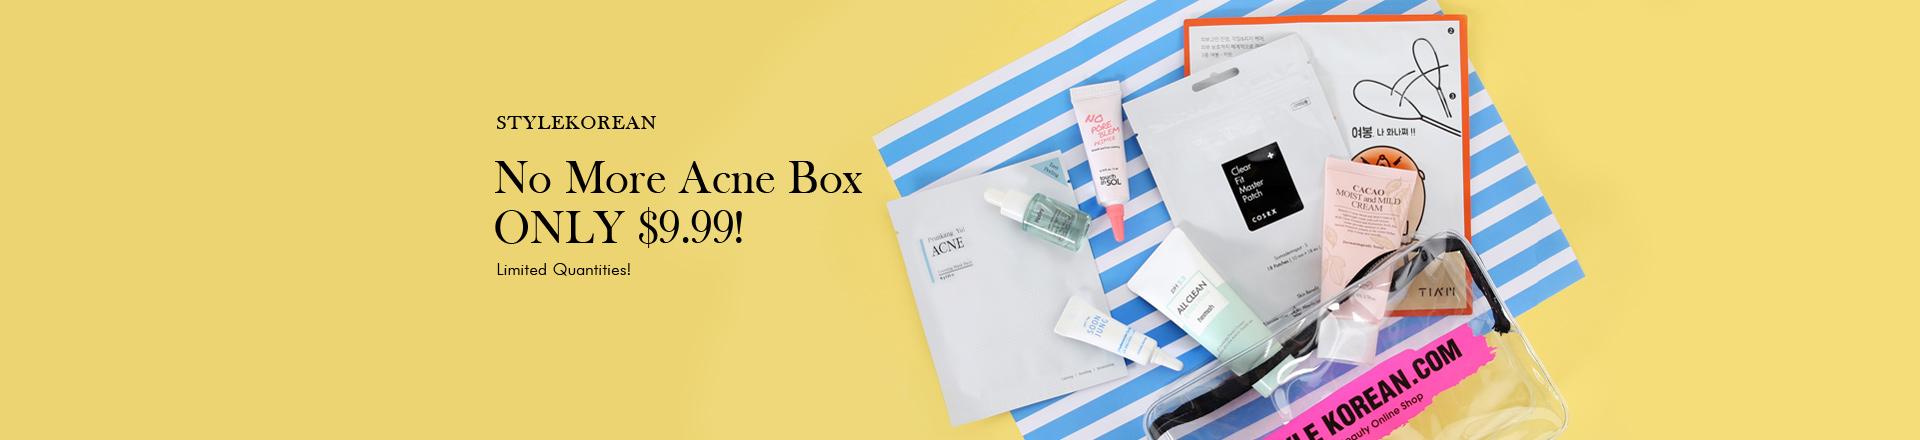 Kbeauty box 5